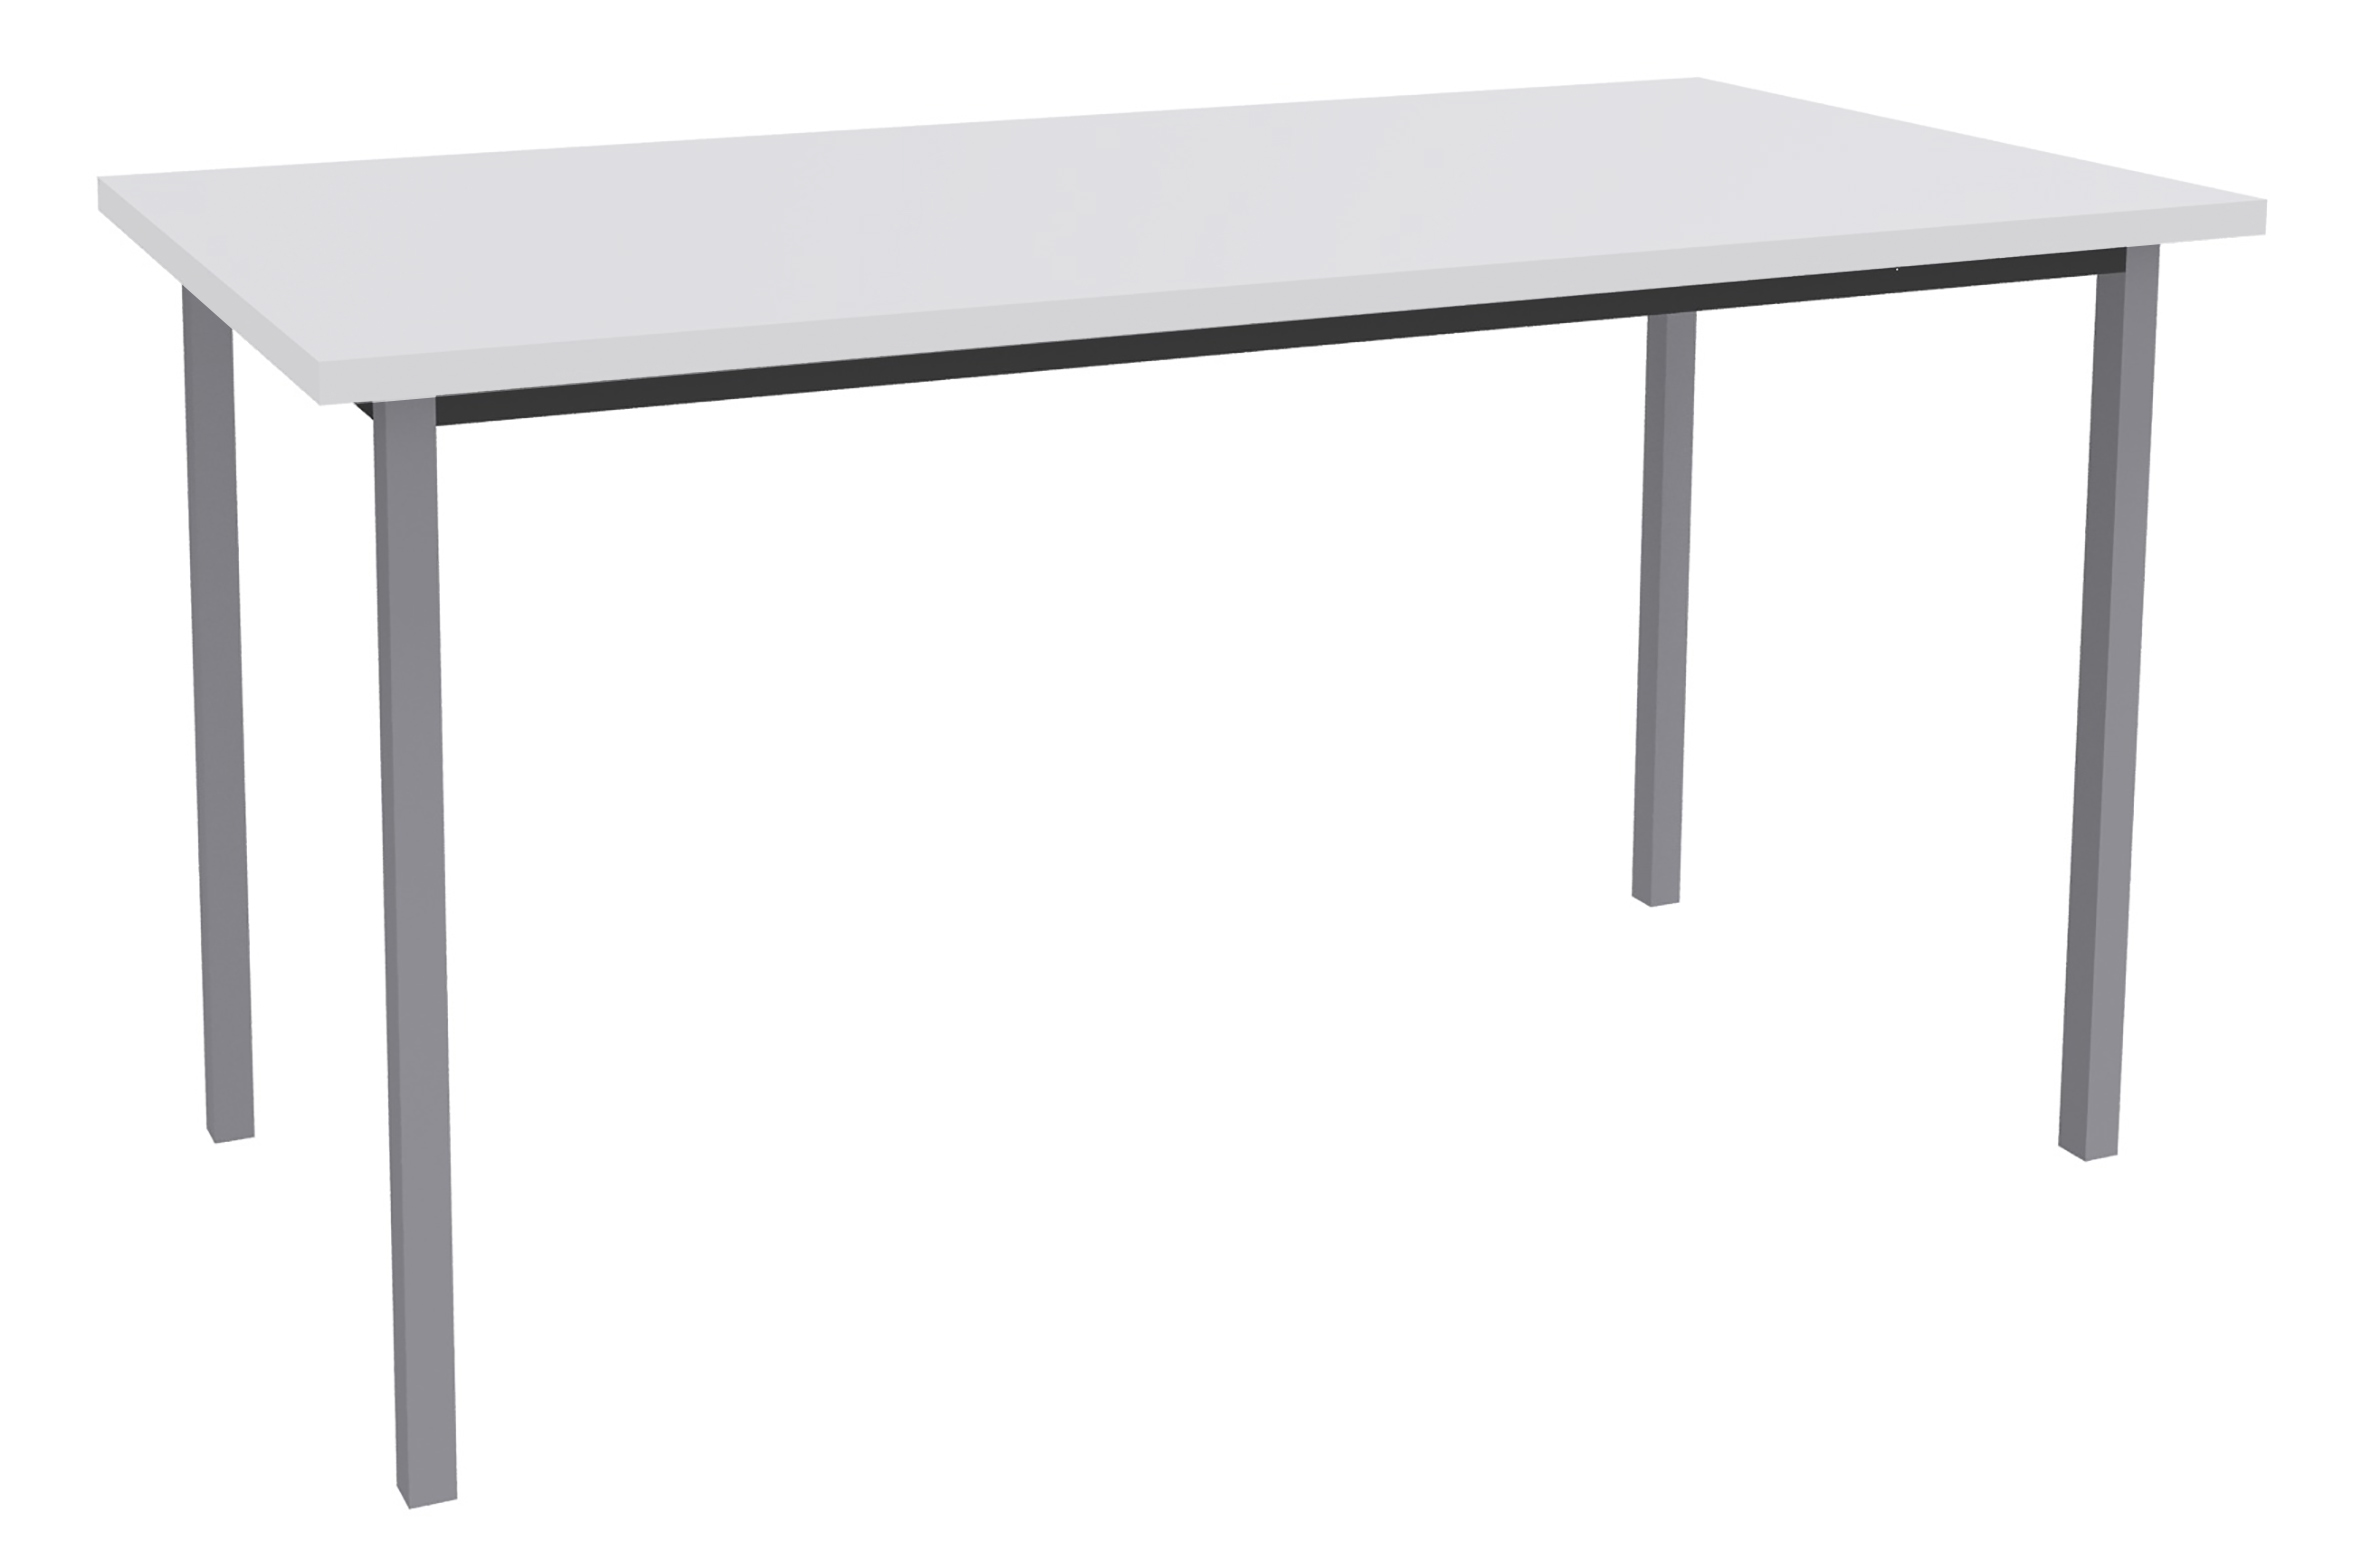 Table de réunion Rectangulaire - 120 x 60 cm - Pieds aluminium - blanc perle